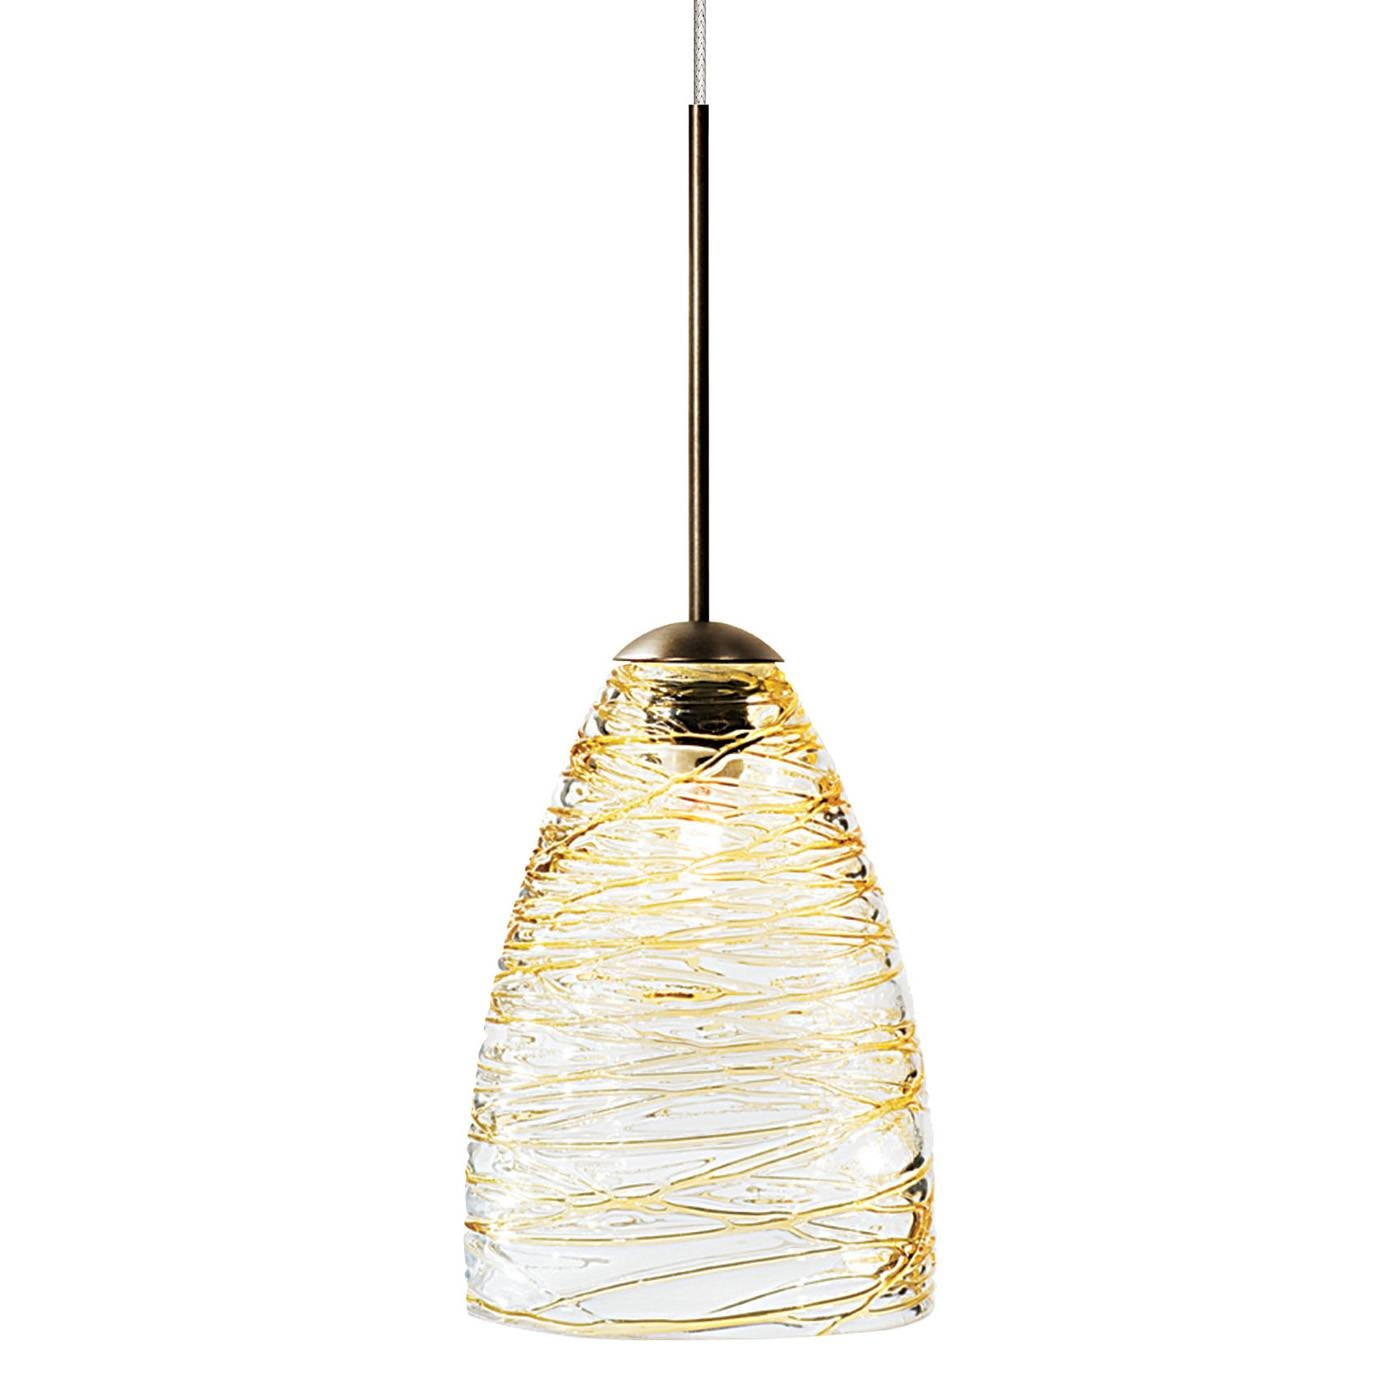 Ceiling Lights : Stunning Track Lighting Pendant Exposed Bulb regarding Exposed Bulb Pendant Track Lighting (Image 7 of 15)